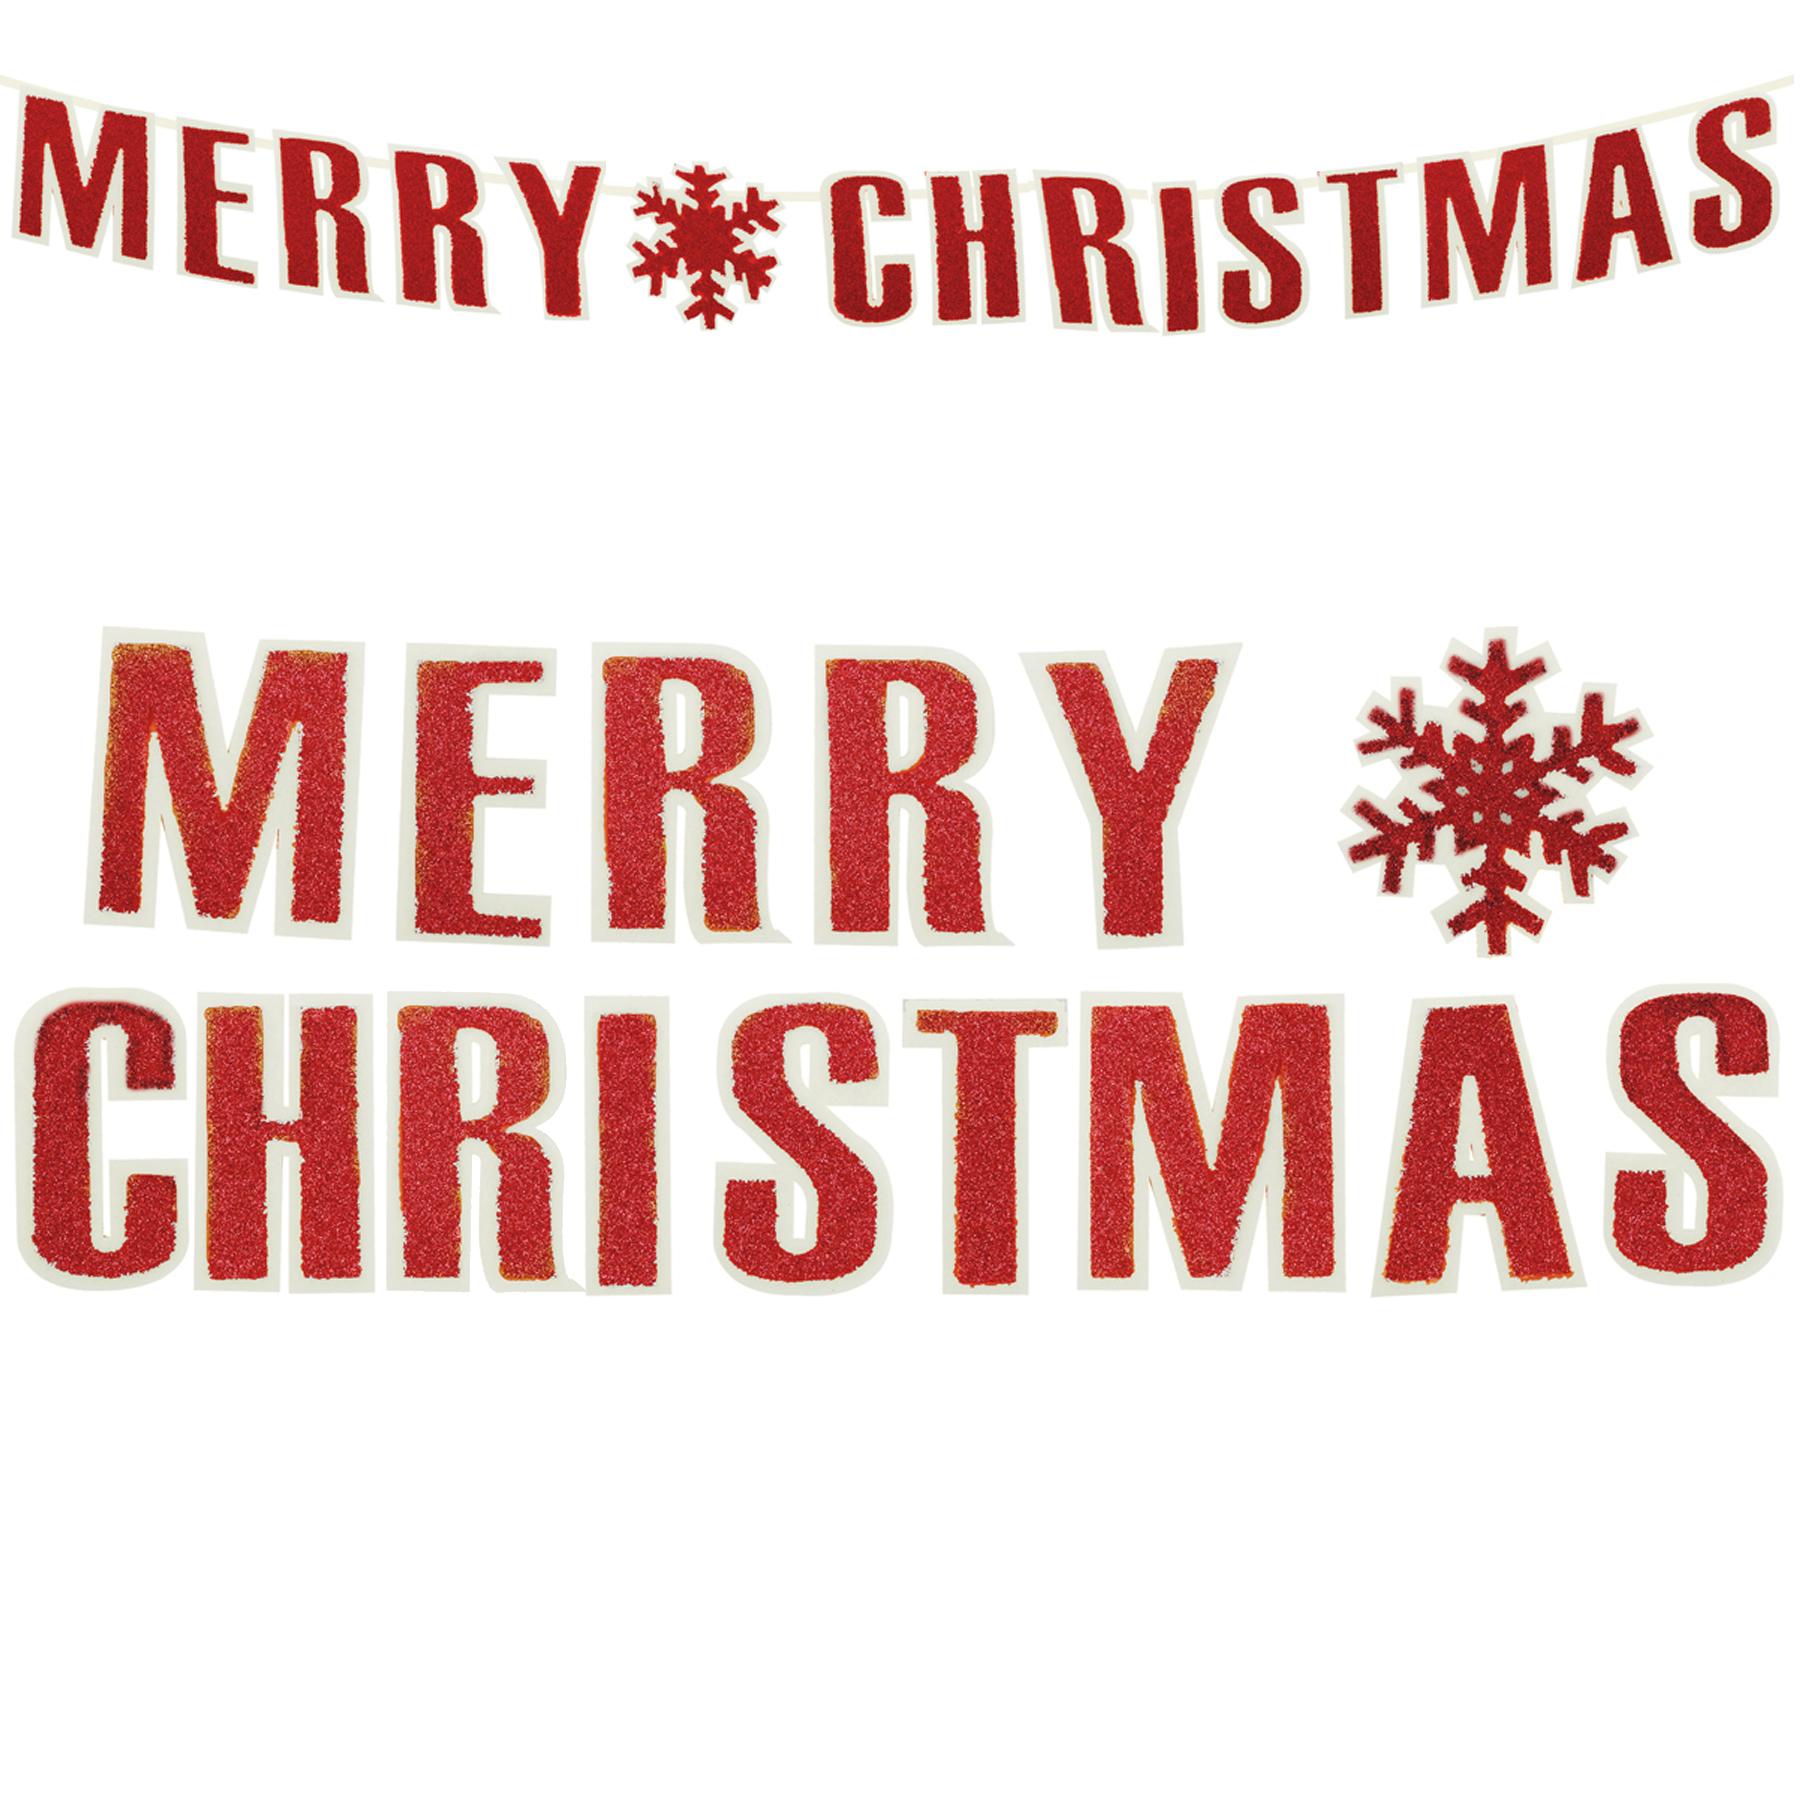 Merry Christmas Felt Garland 1 6m Hanging Decoration Red White Ebay